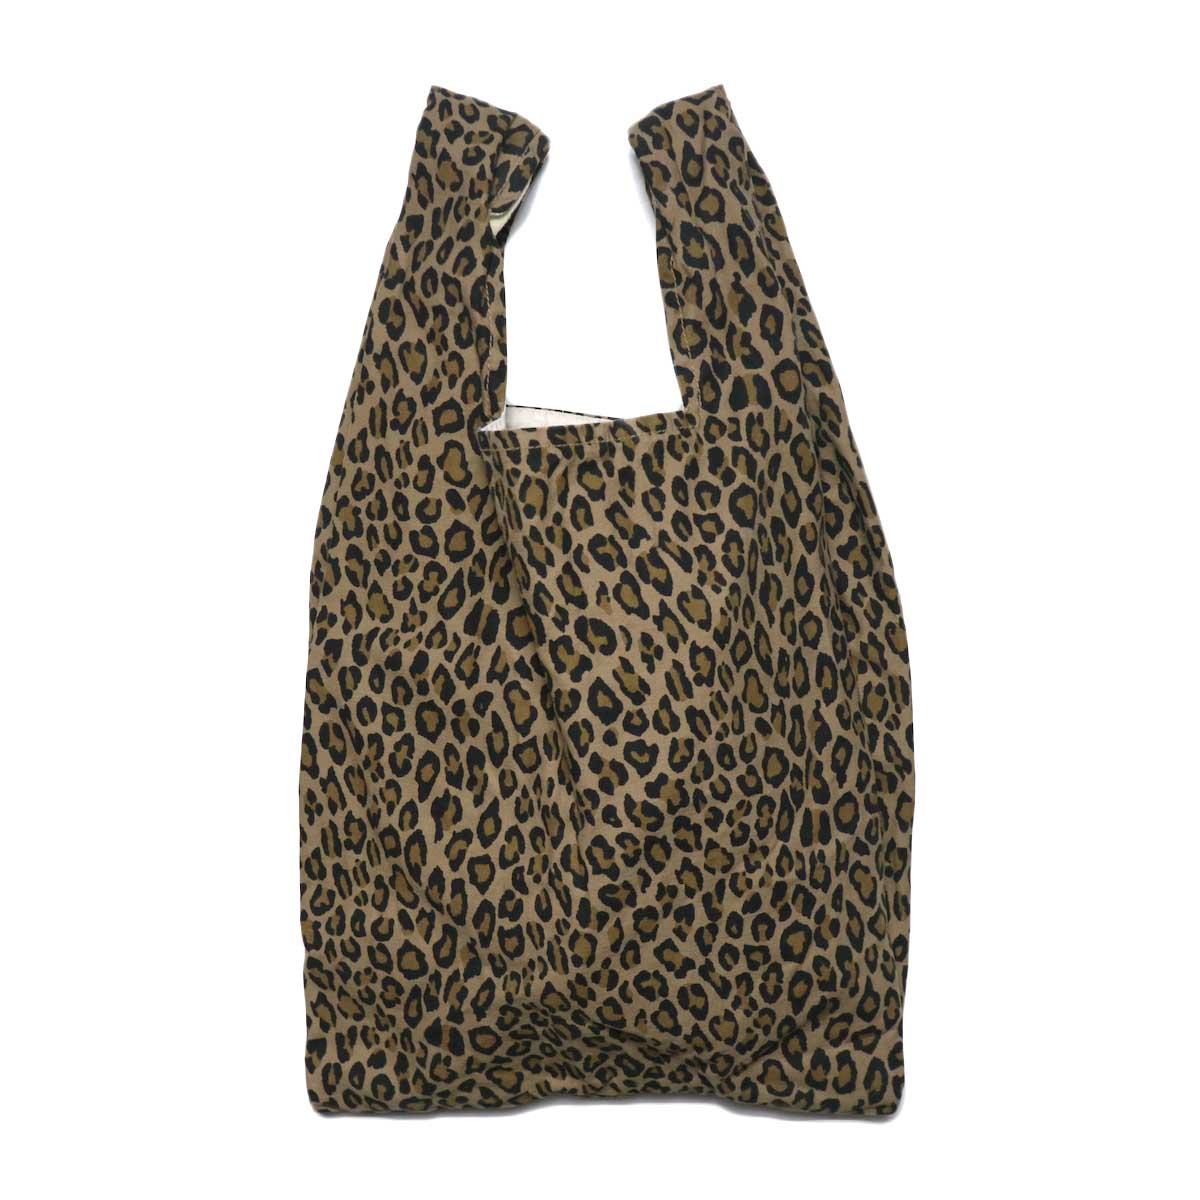 MASTER & Co. / ECO BAG SMALL (Leopard)